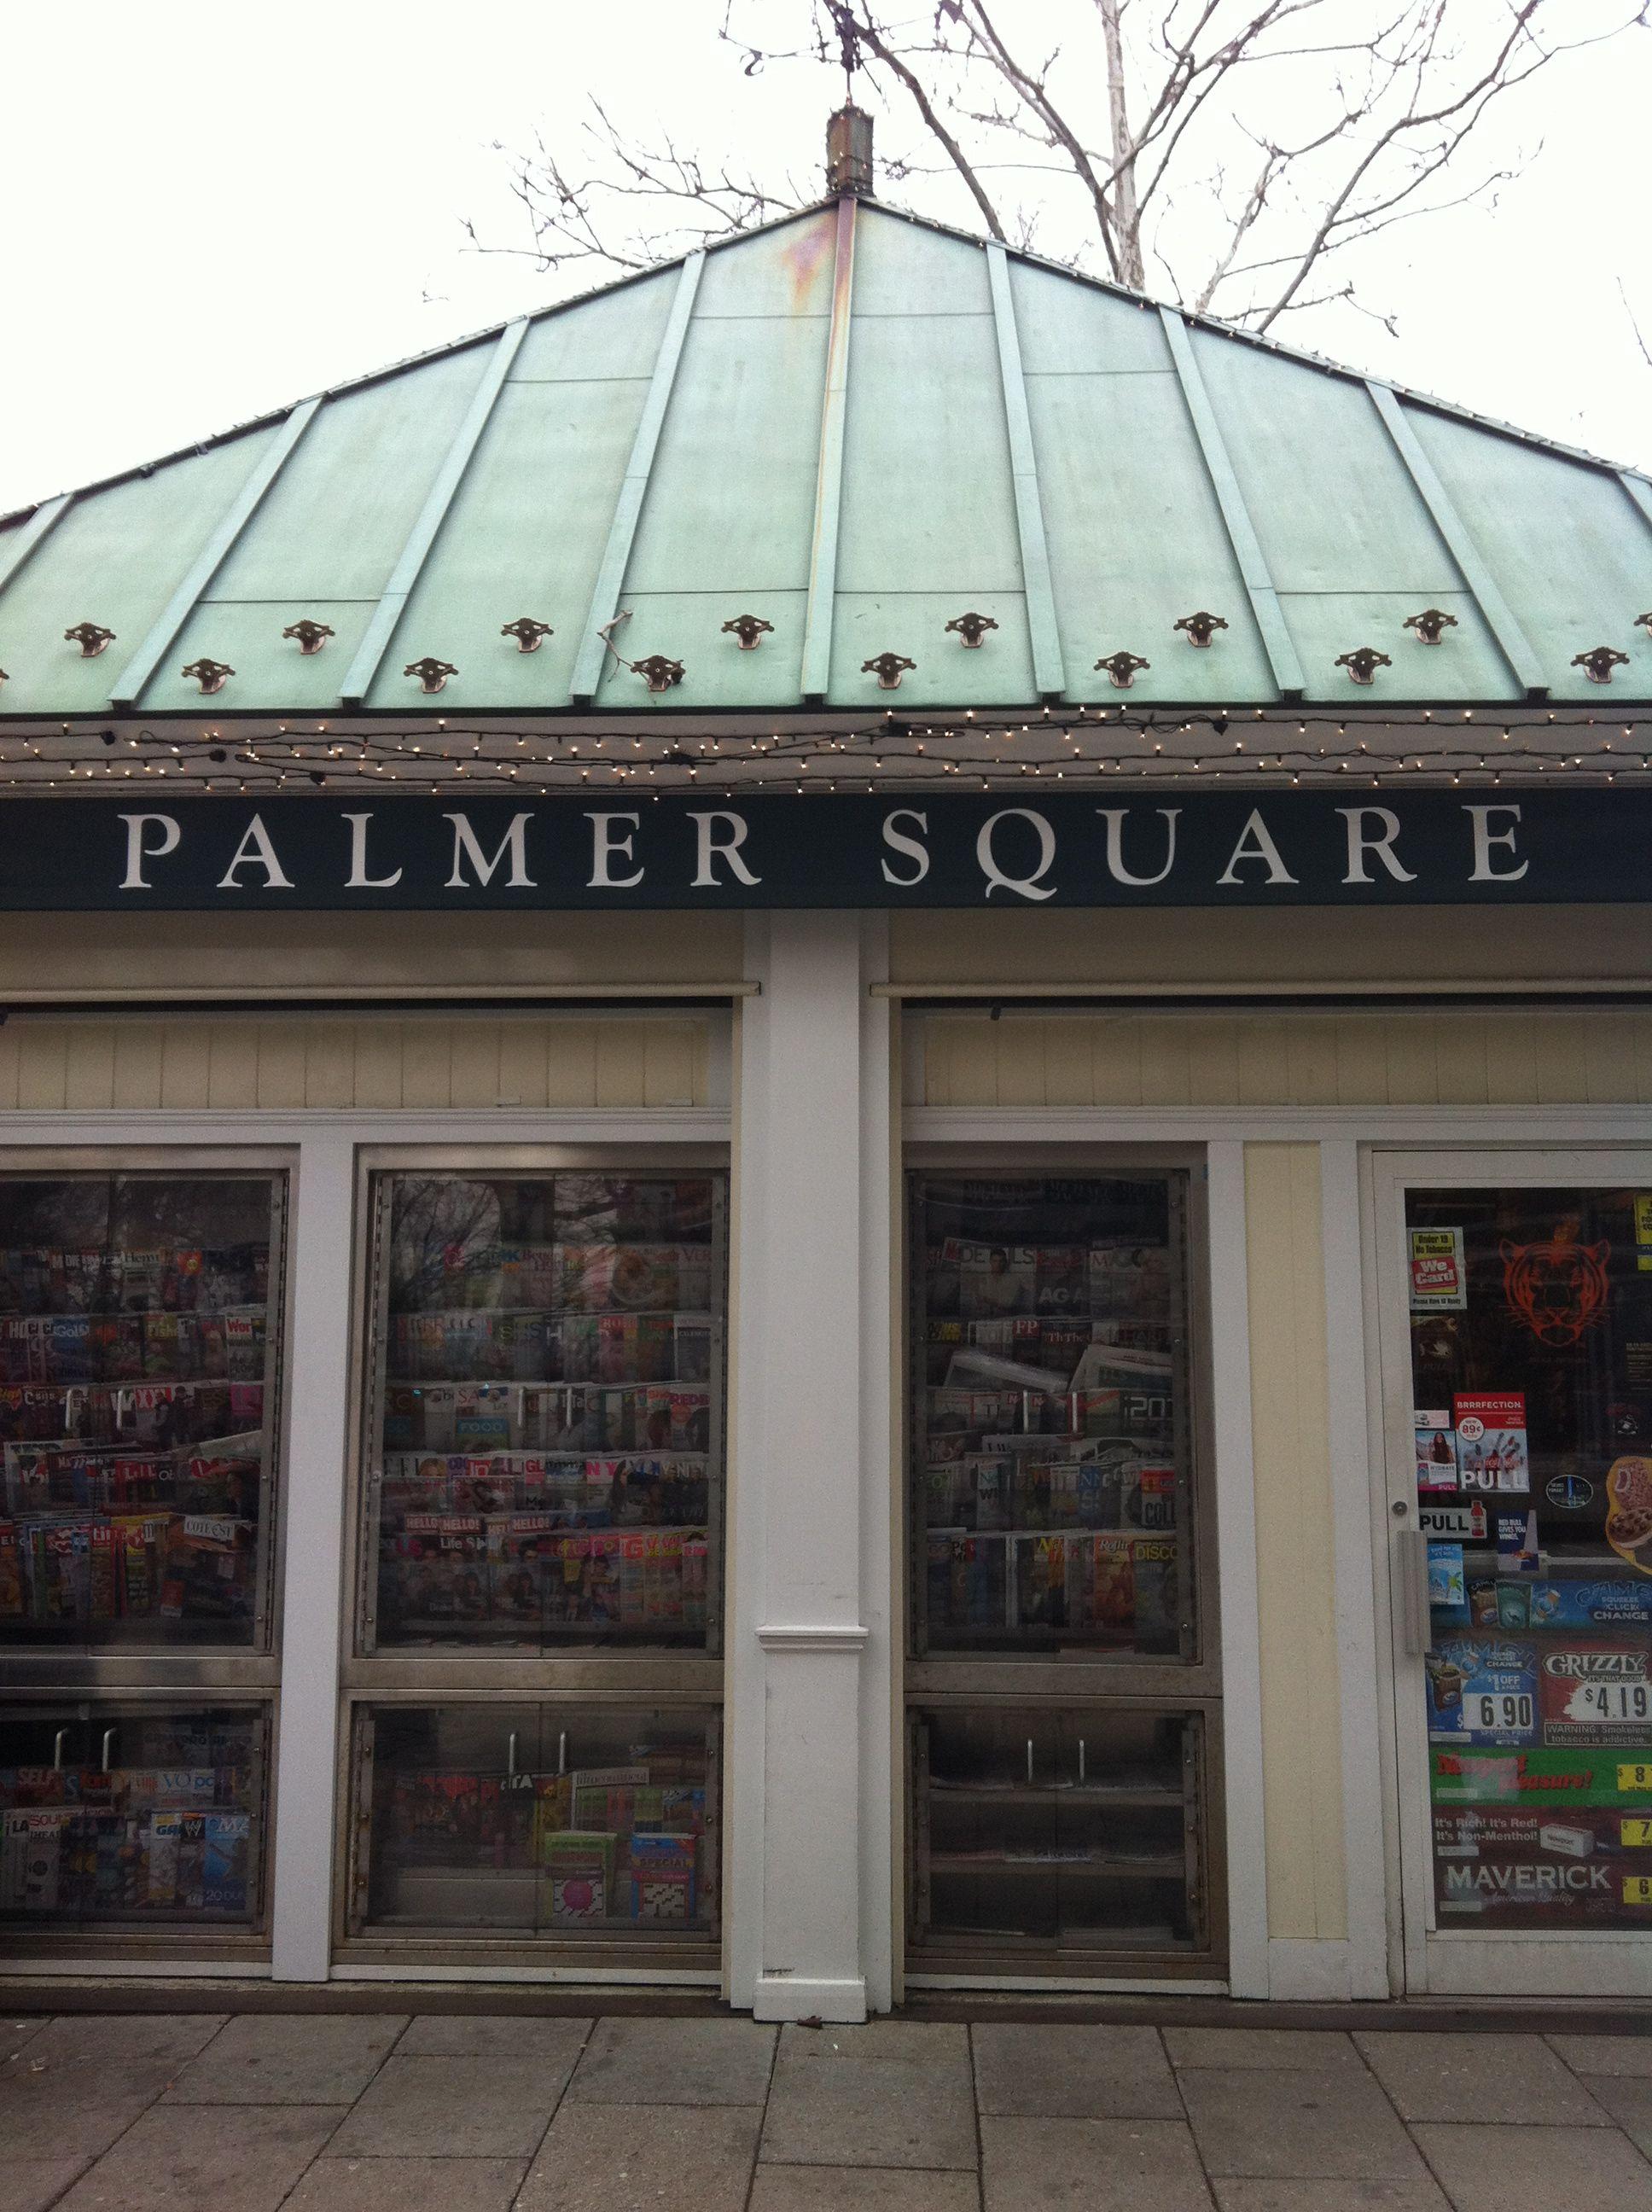 Restaurants Ping So Much More Palmer Square Princeton Nj